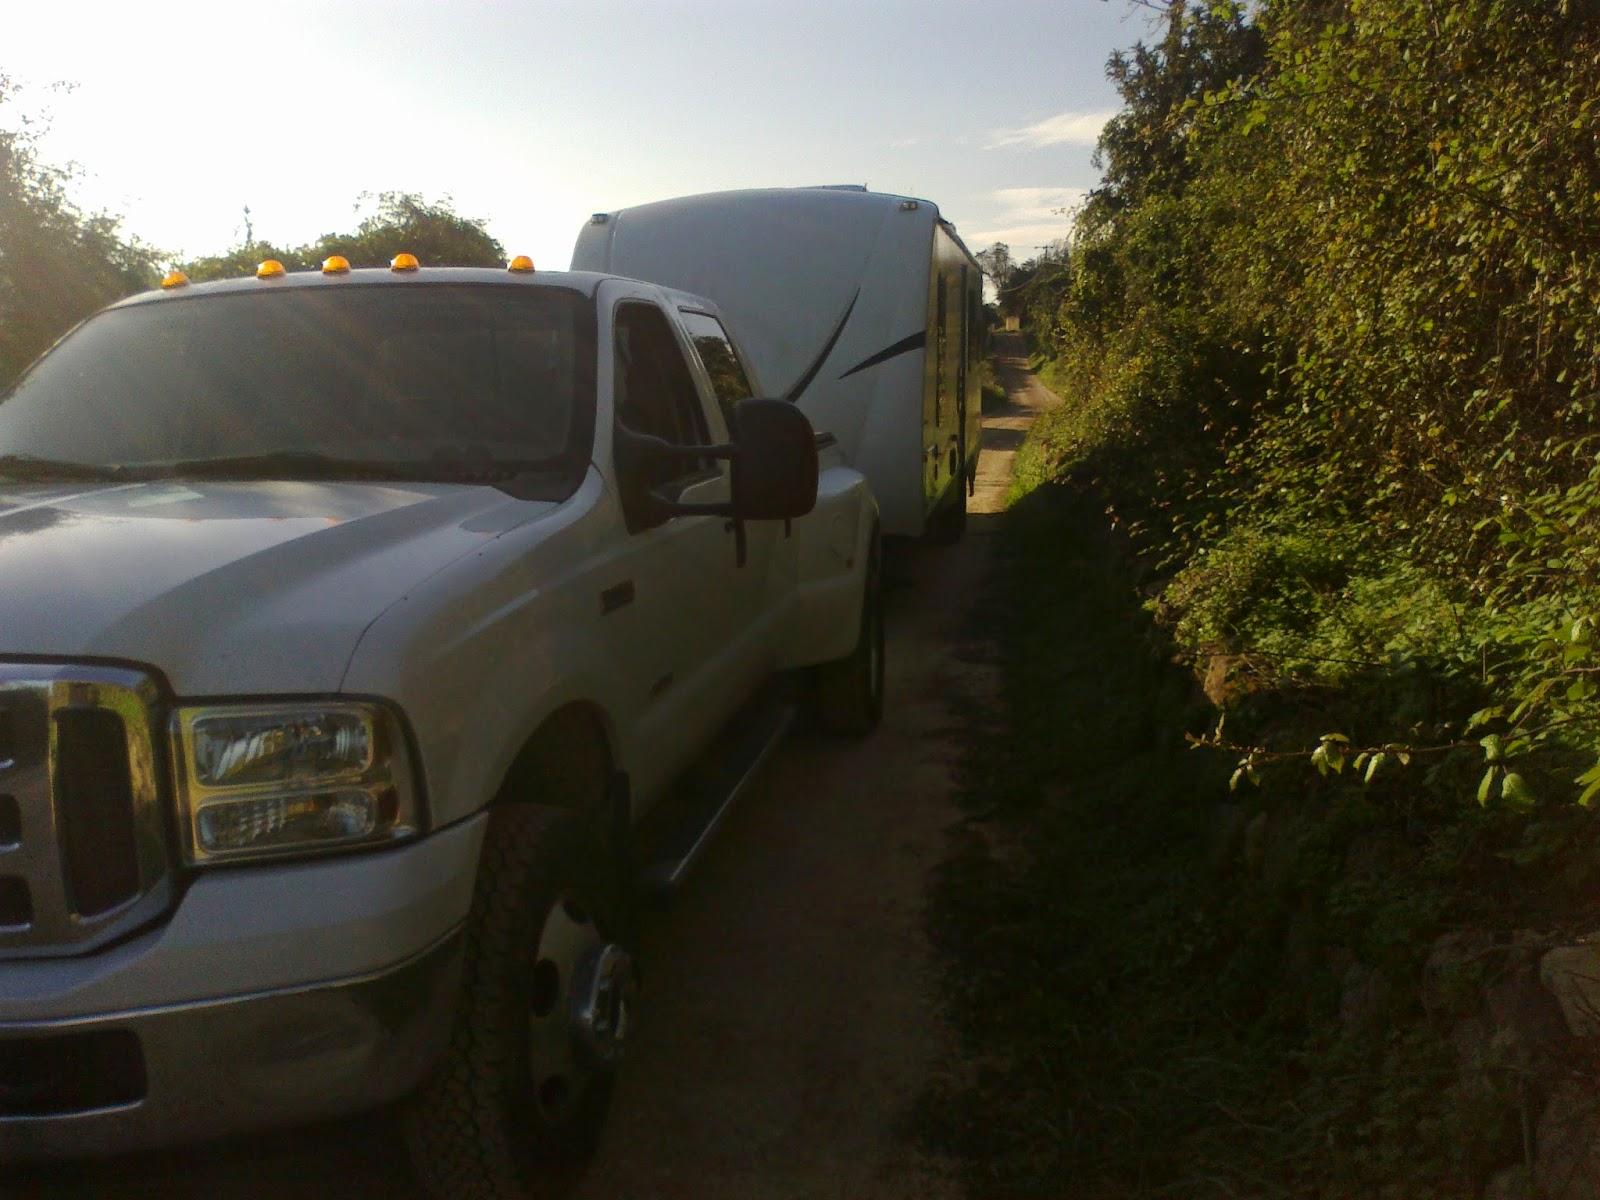 European American caravan delivery and transport